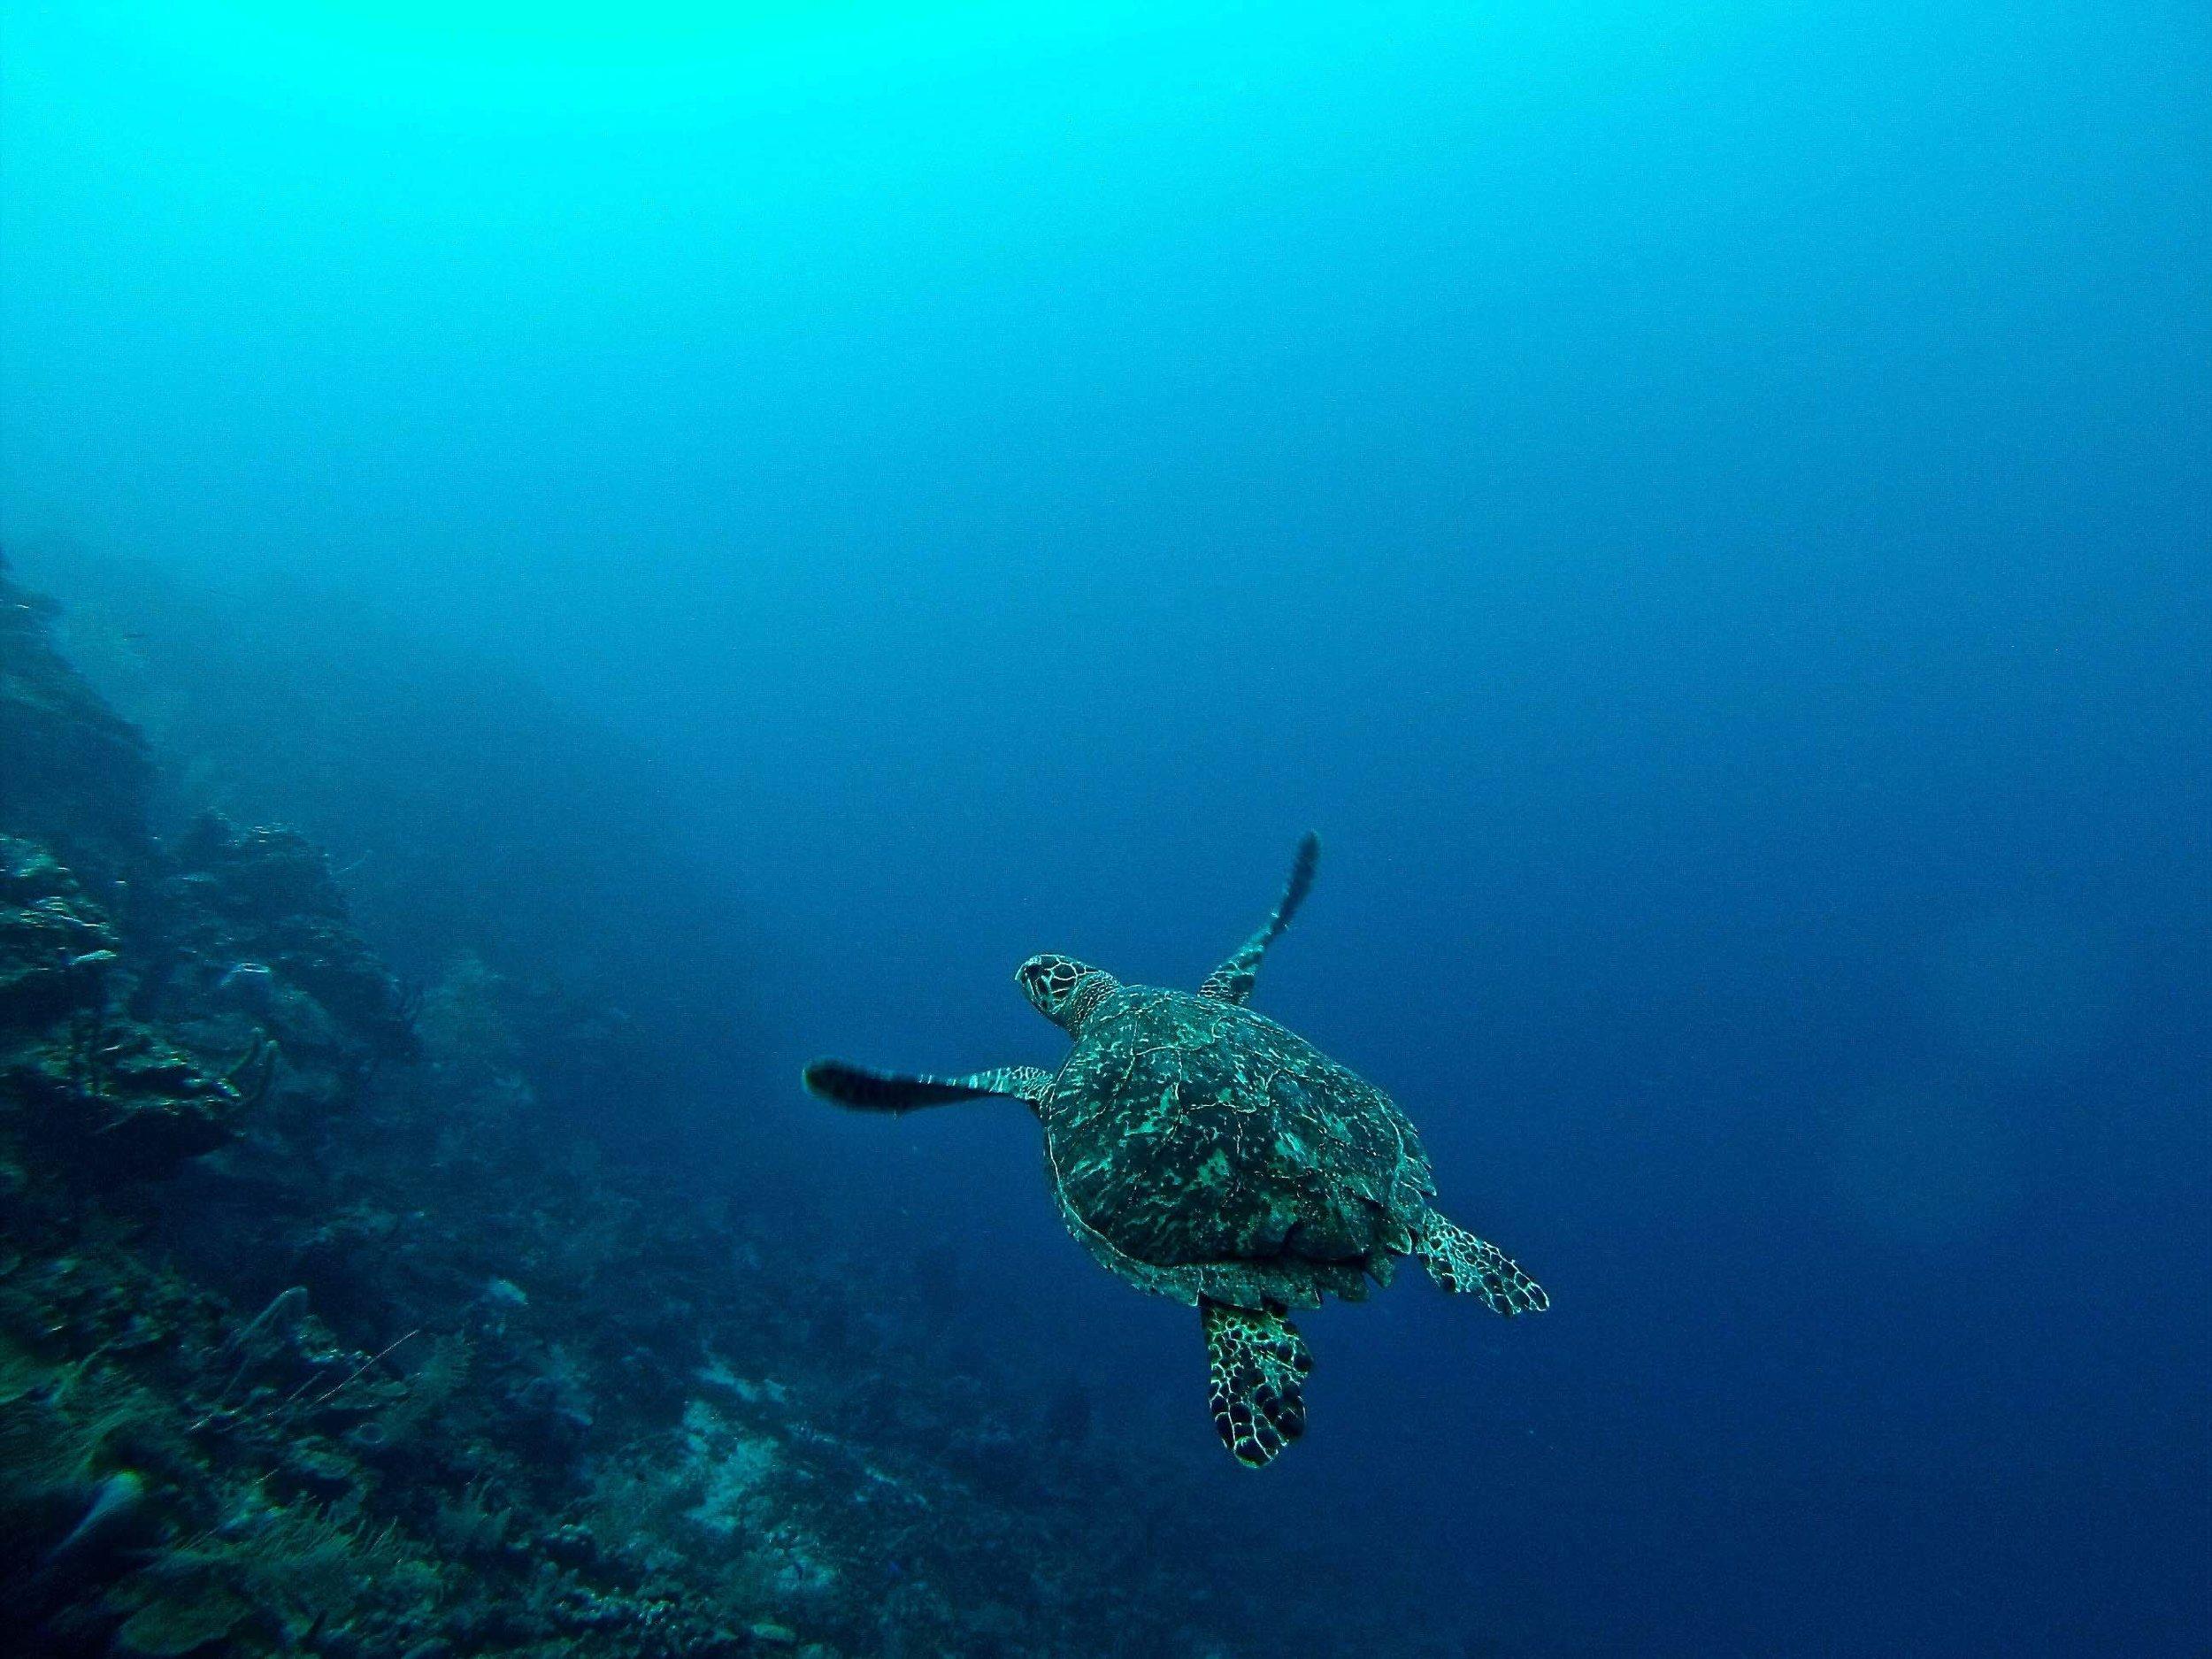 Sea Turtle swimming off the Honduran diving mecca of Roatán.Photo by  Erin Simmons on  Unsplash